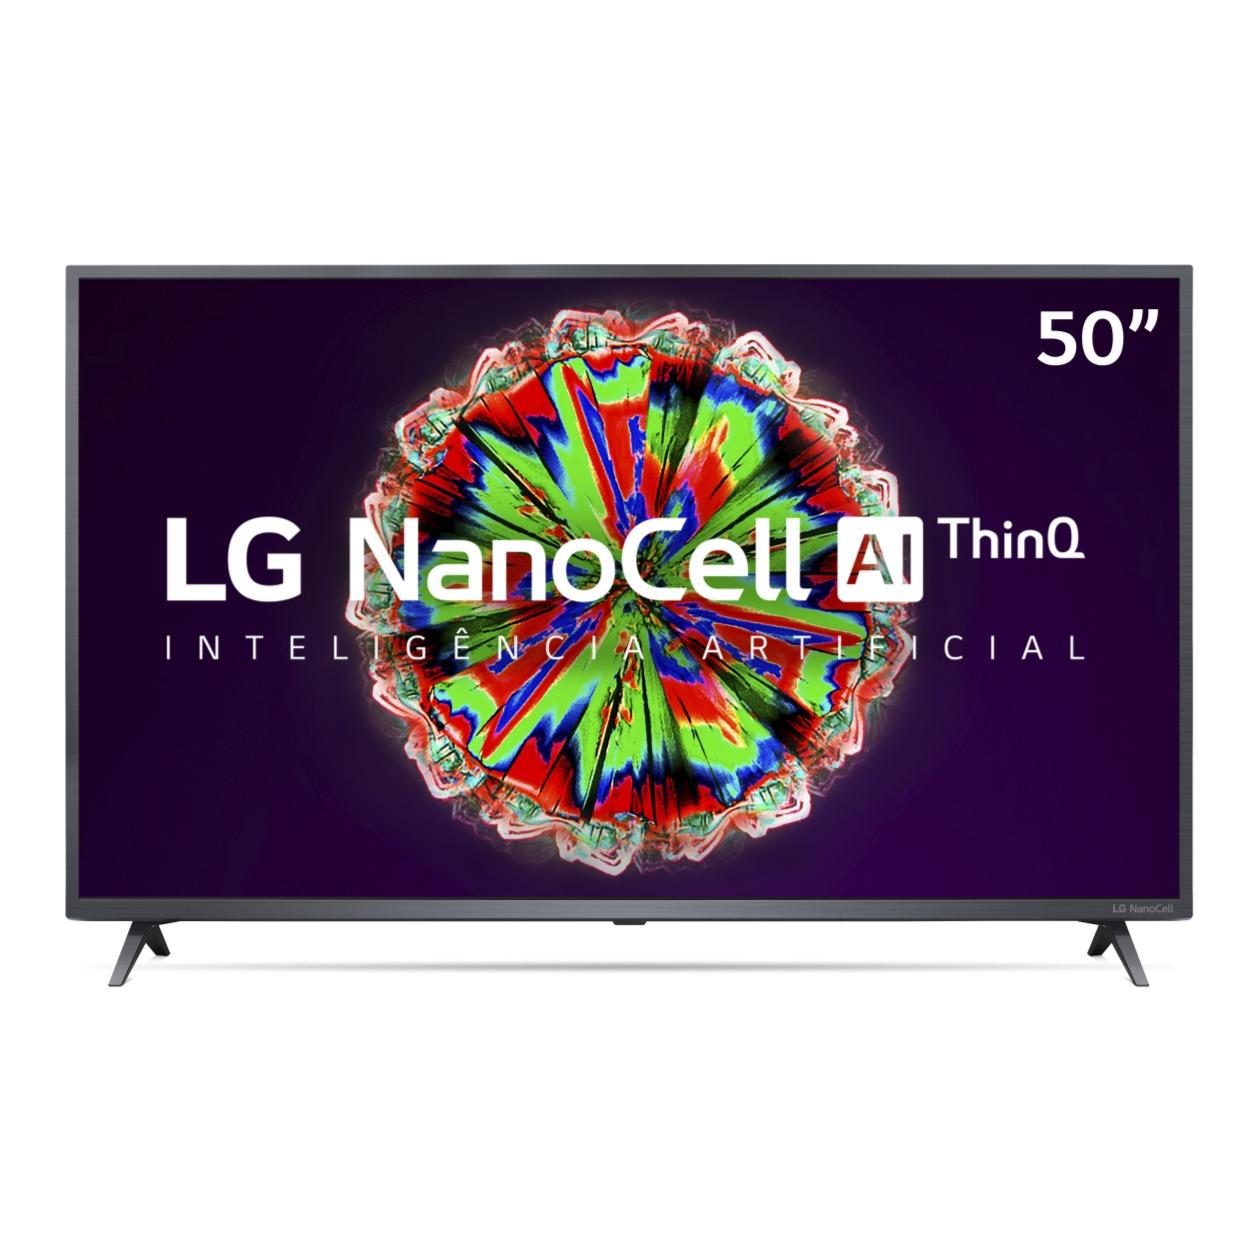 Smart TV LED 50 LG NanoCell 4KUltra HD HDR10 Pro Bluetooth Alexa Google Assistente ThinQ AI 50NANO79SND - Wi-Fi 3 HDMI 2 USB